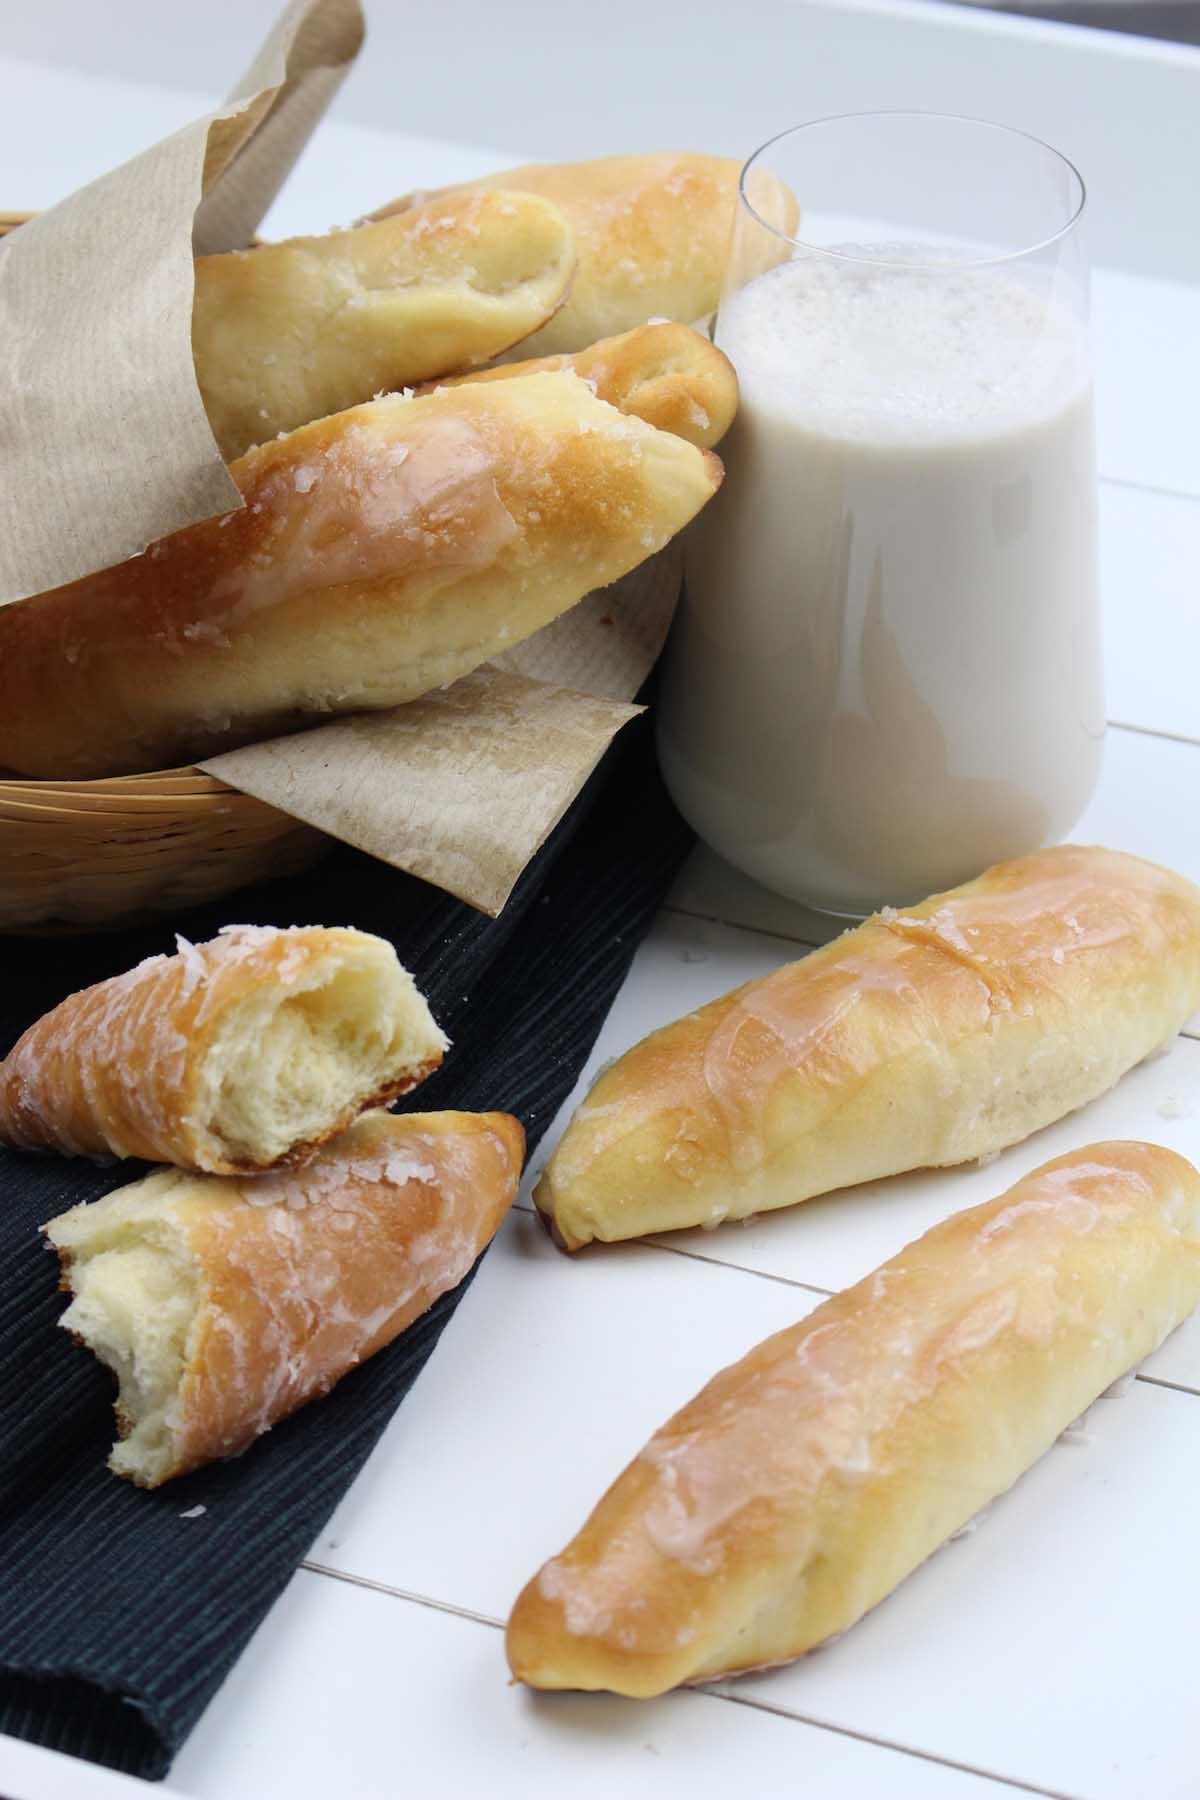 Fartons con glaseado de horchata sin lactosa